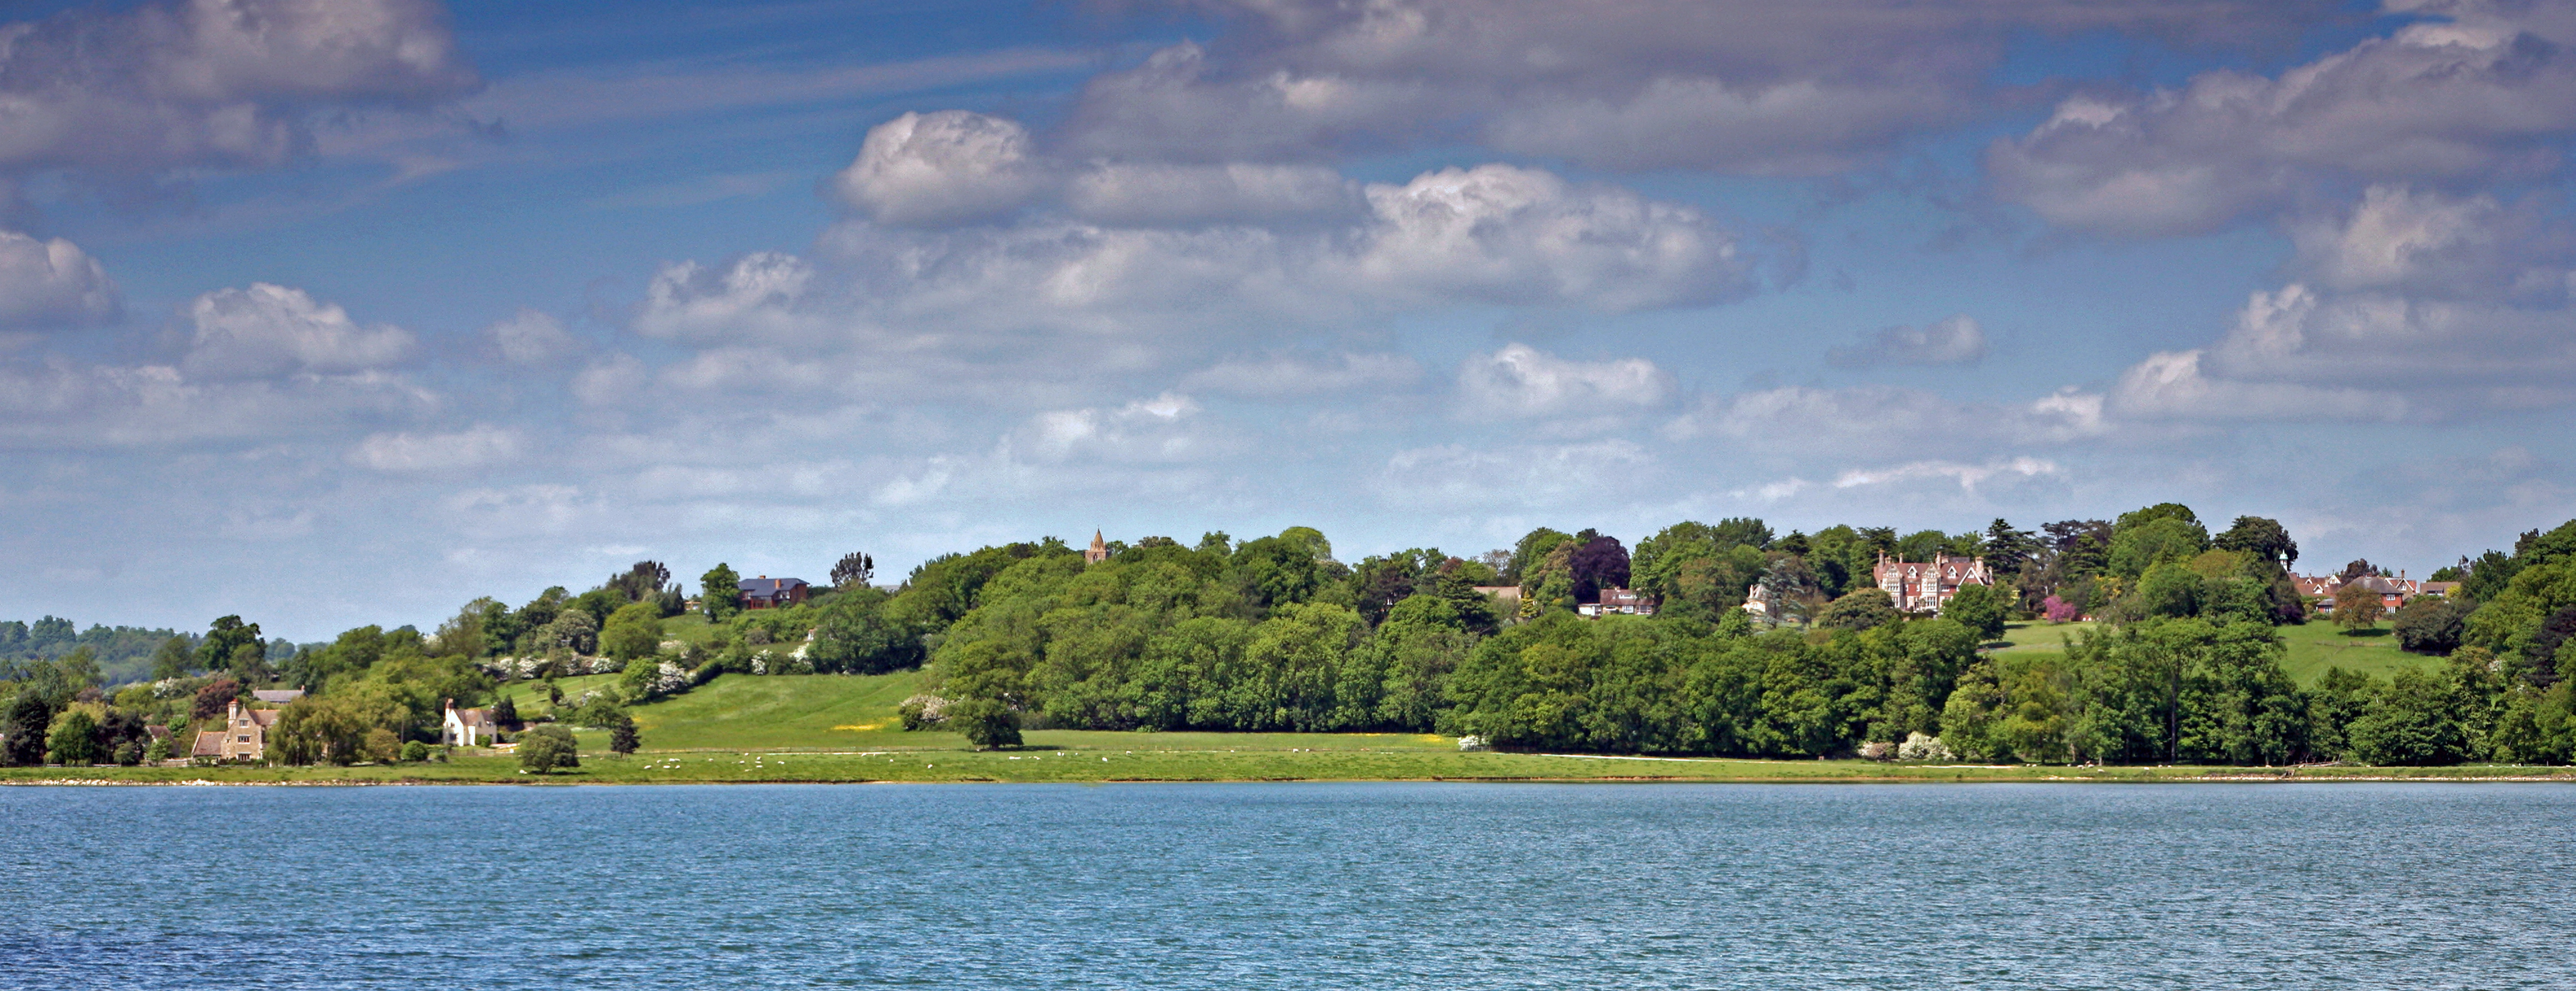 hambleton hall across water